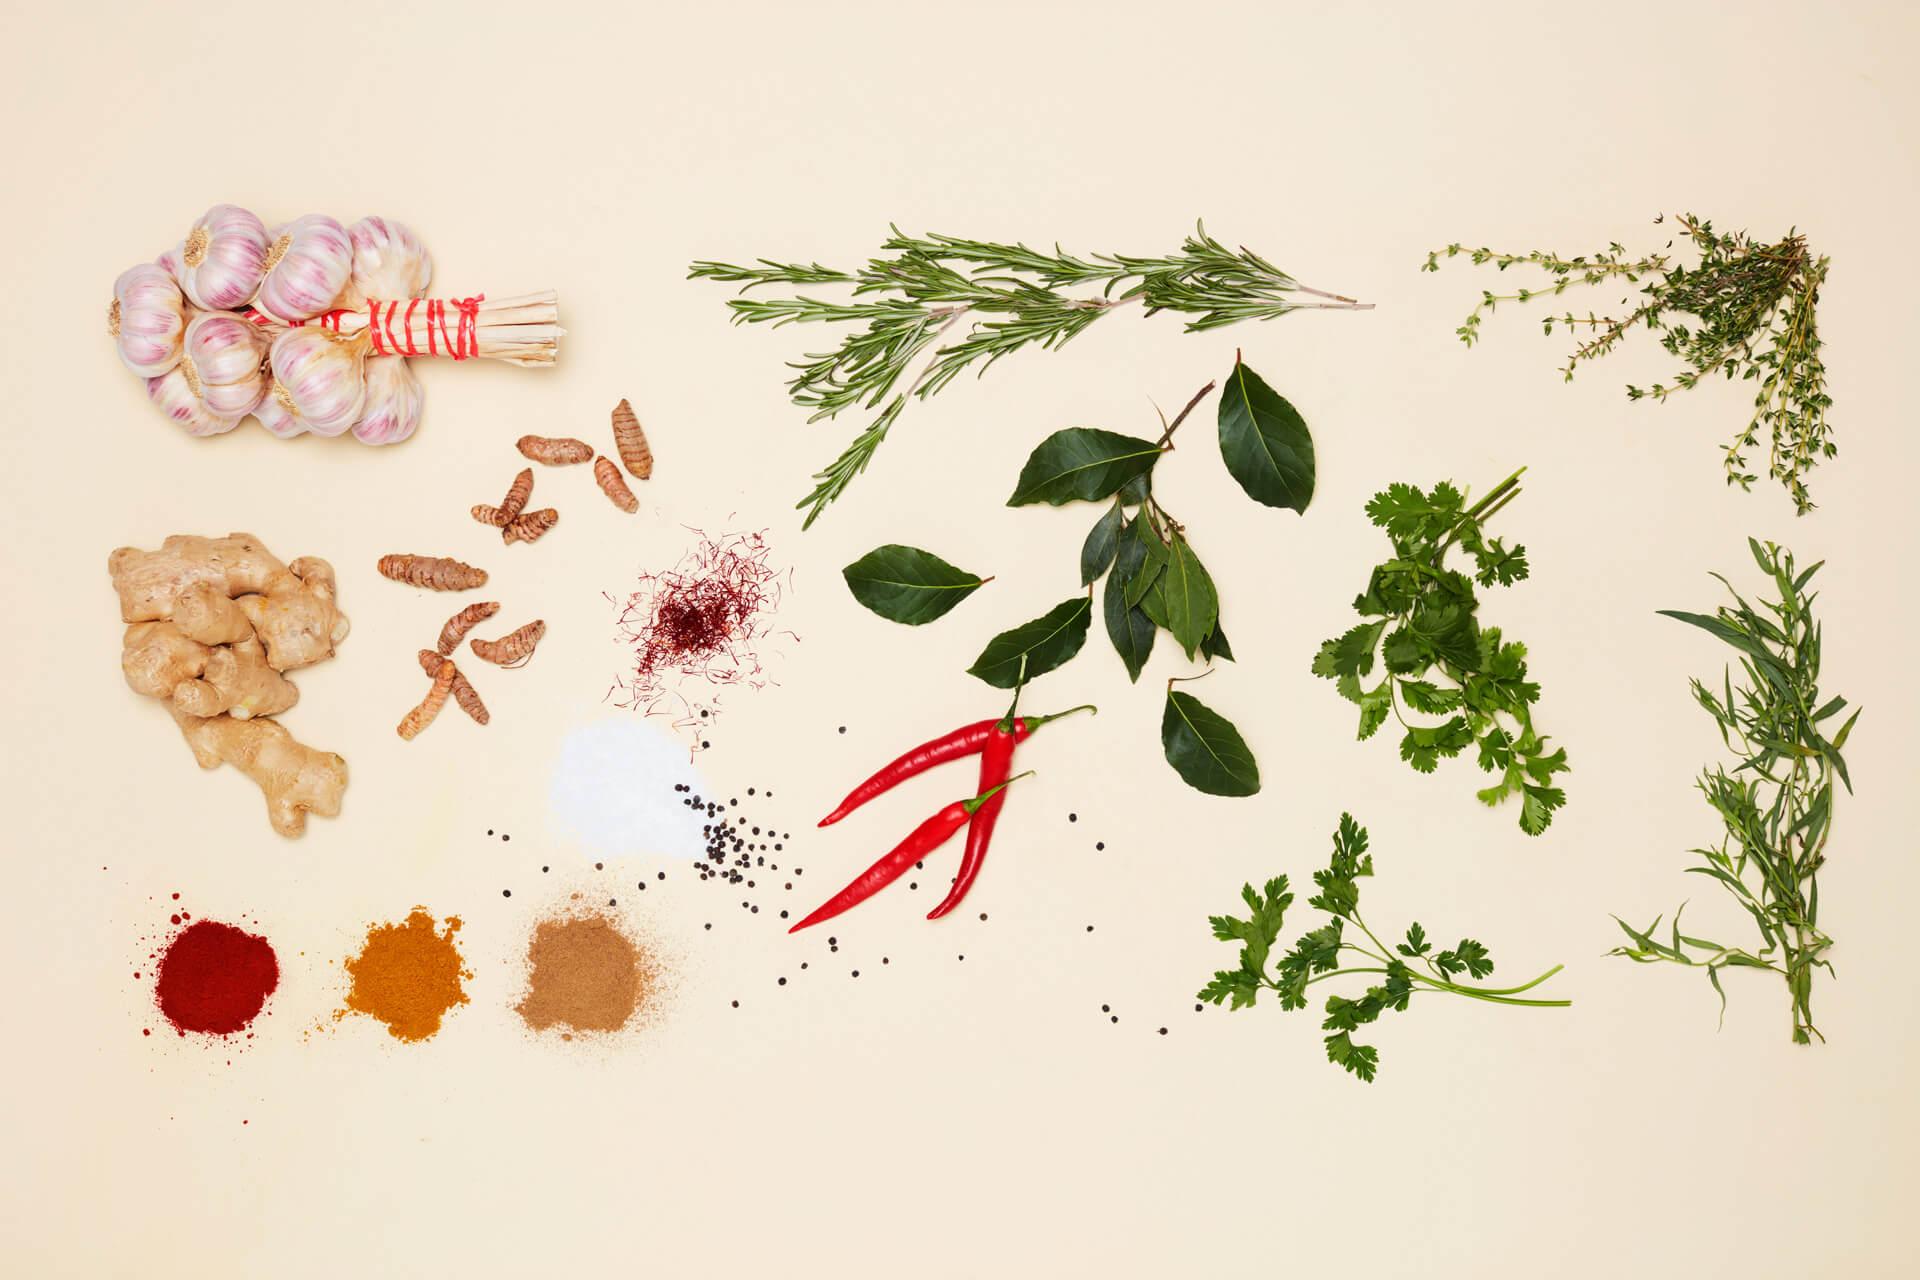 Leffe - food photography by Erik de Koning - main ingredients stew